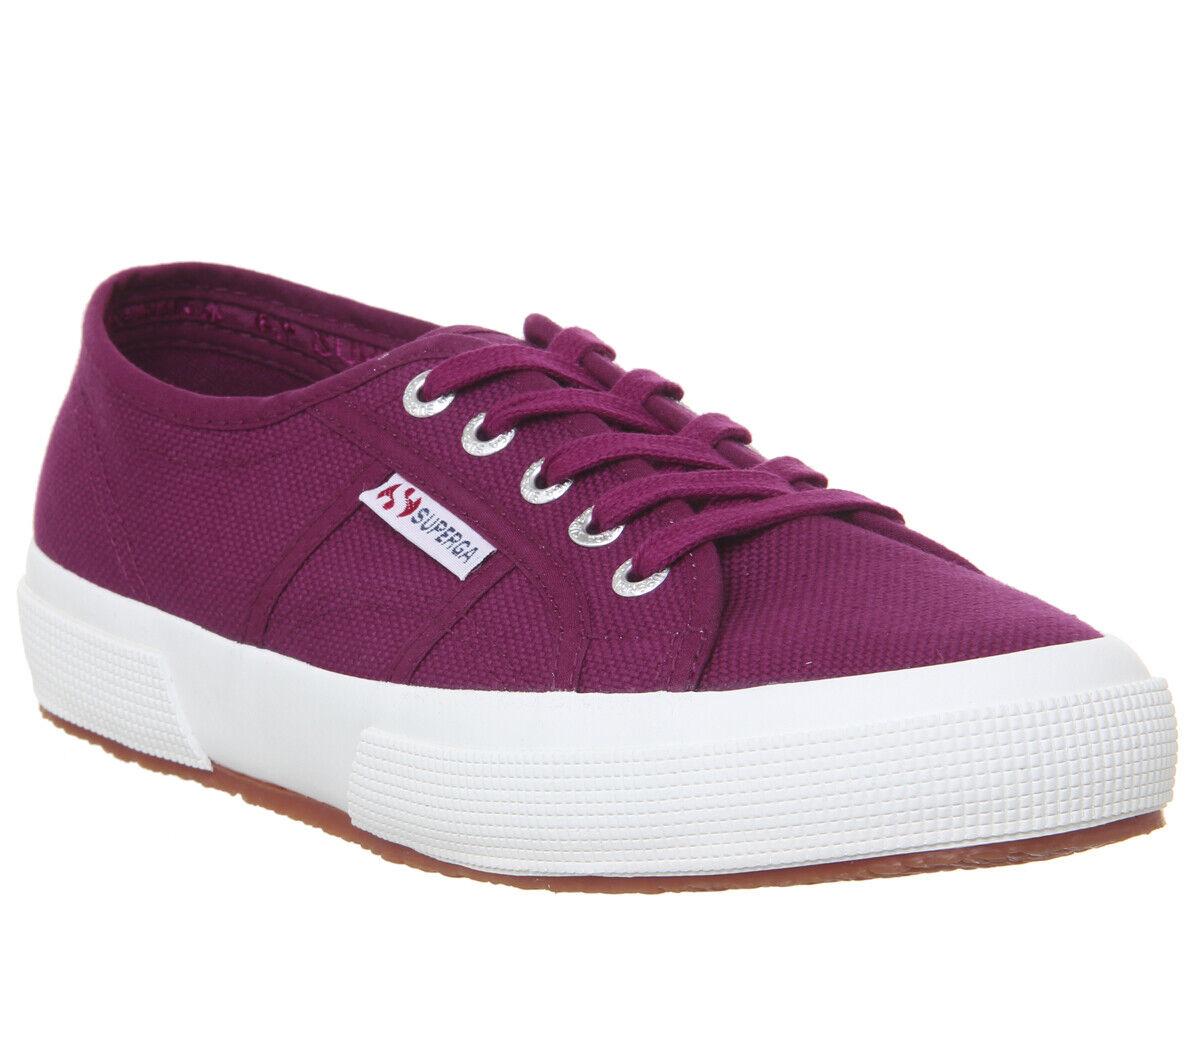 Womens Superga 2750 Trainers Red Magenta Purple Trainers Trainers Trainers shoes 624e4a